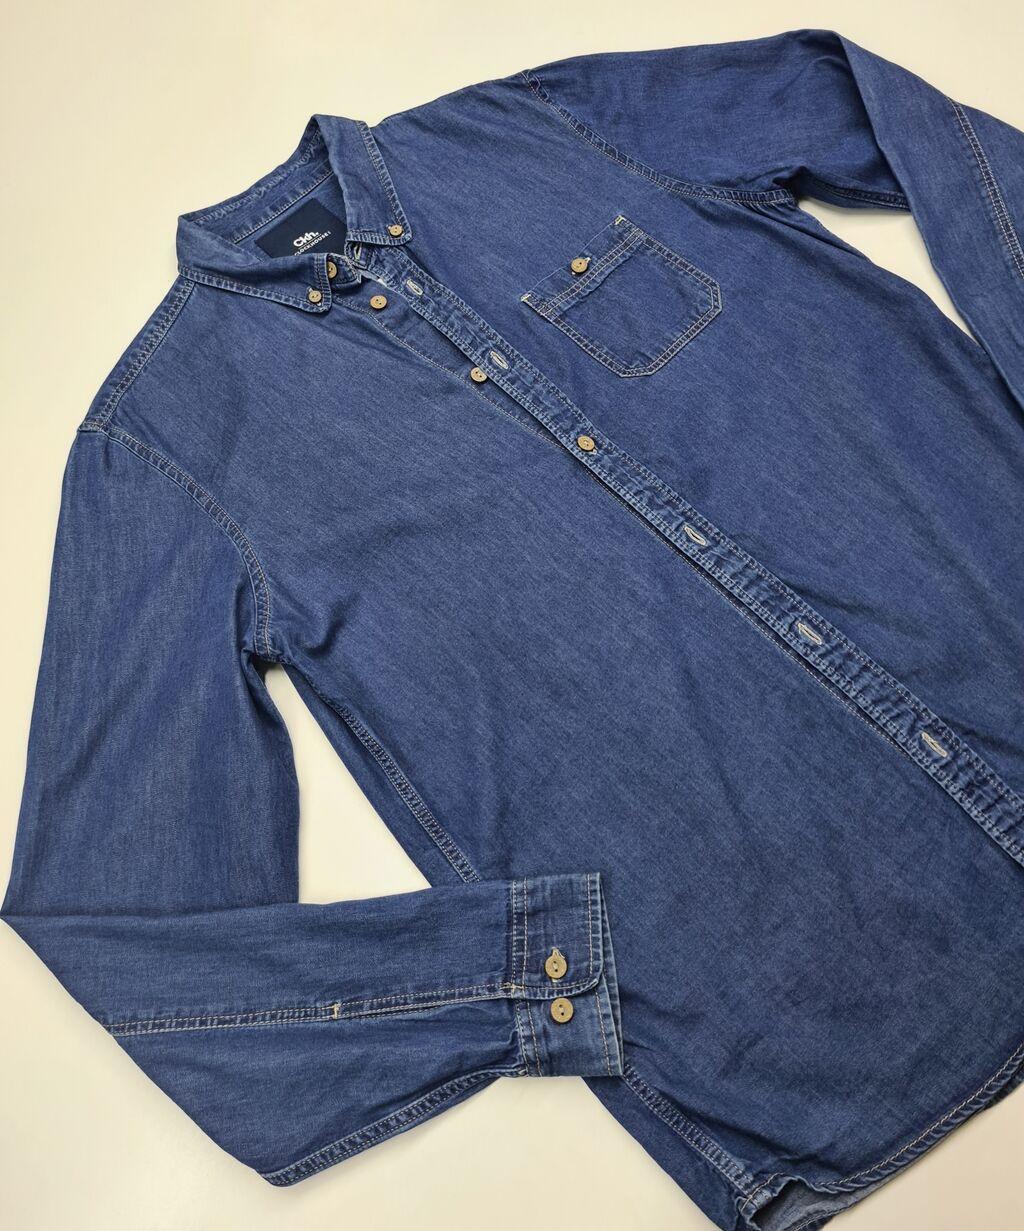 Рубашка джинсы -20%: Рубашка джинсы -20%